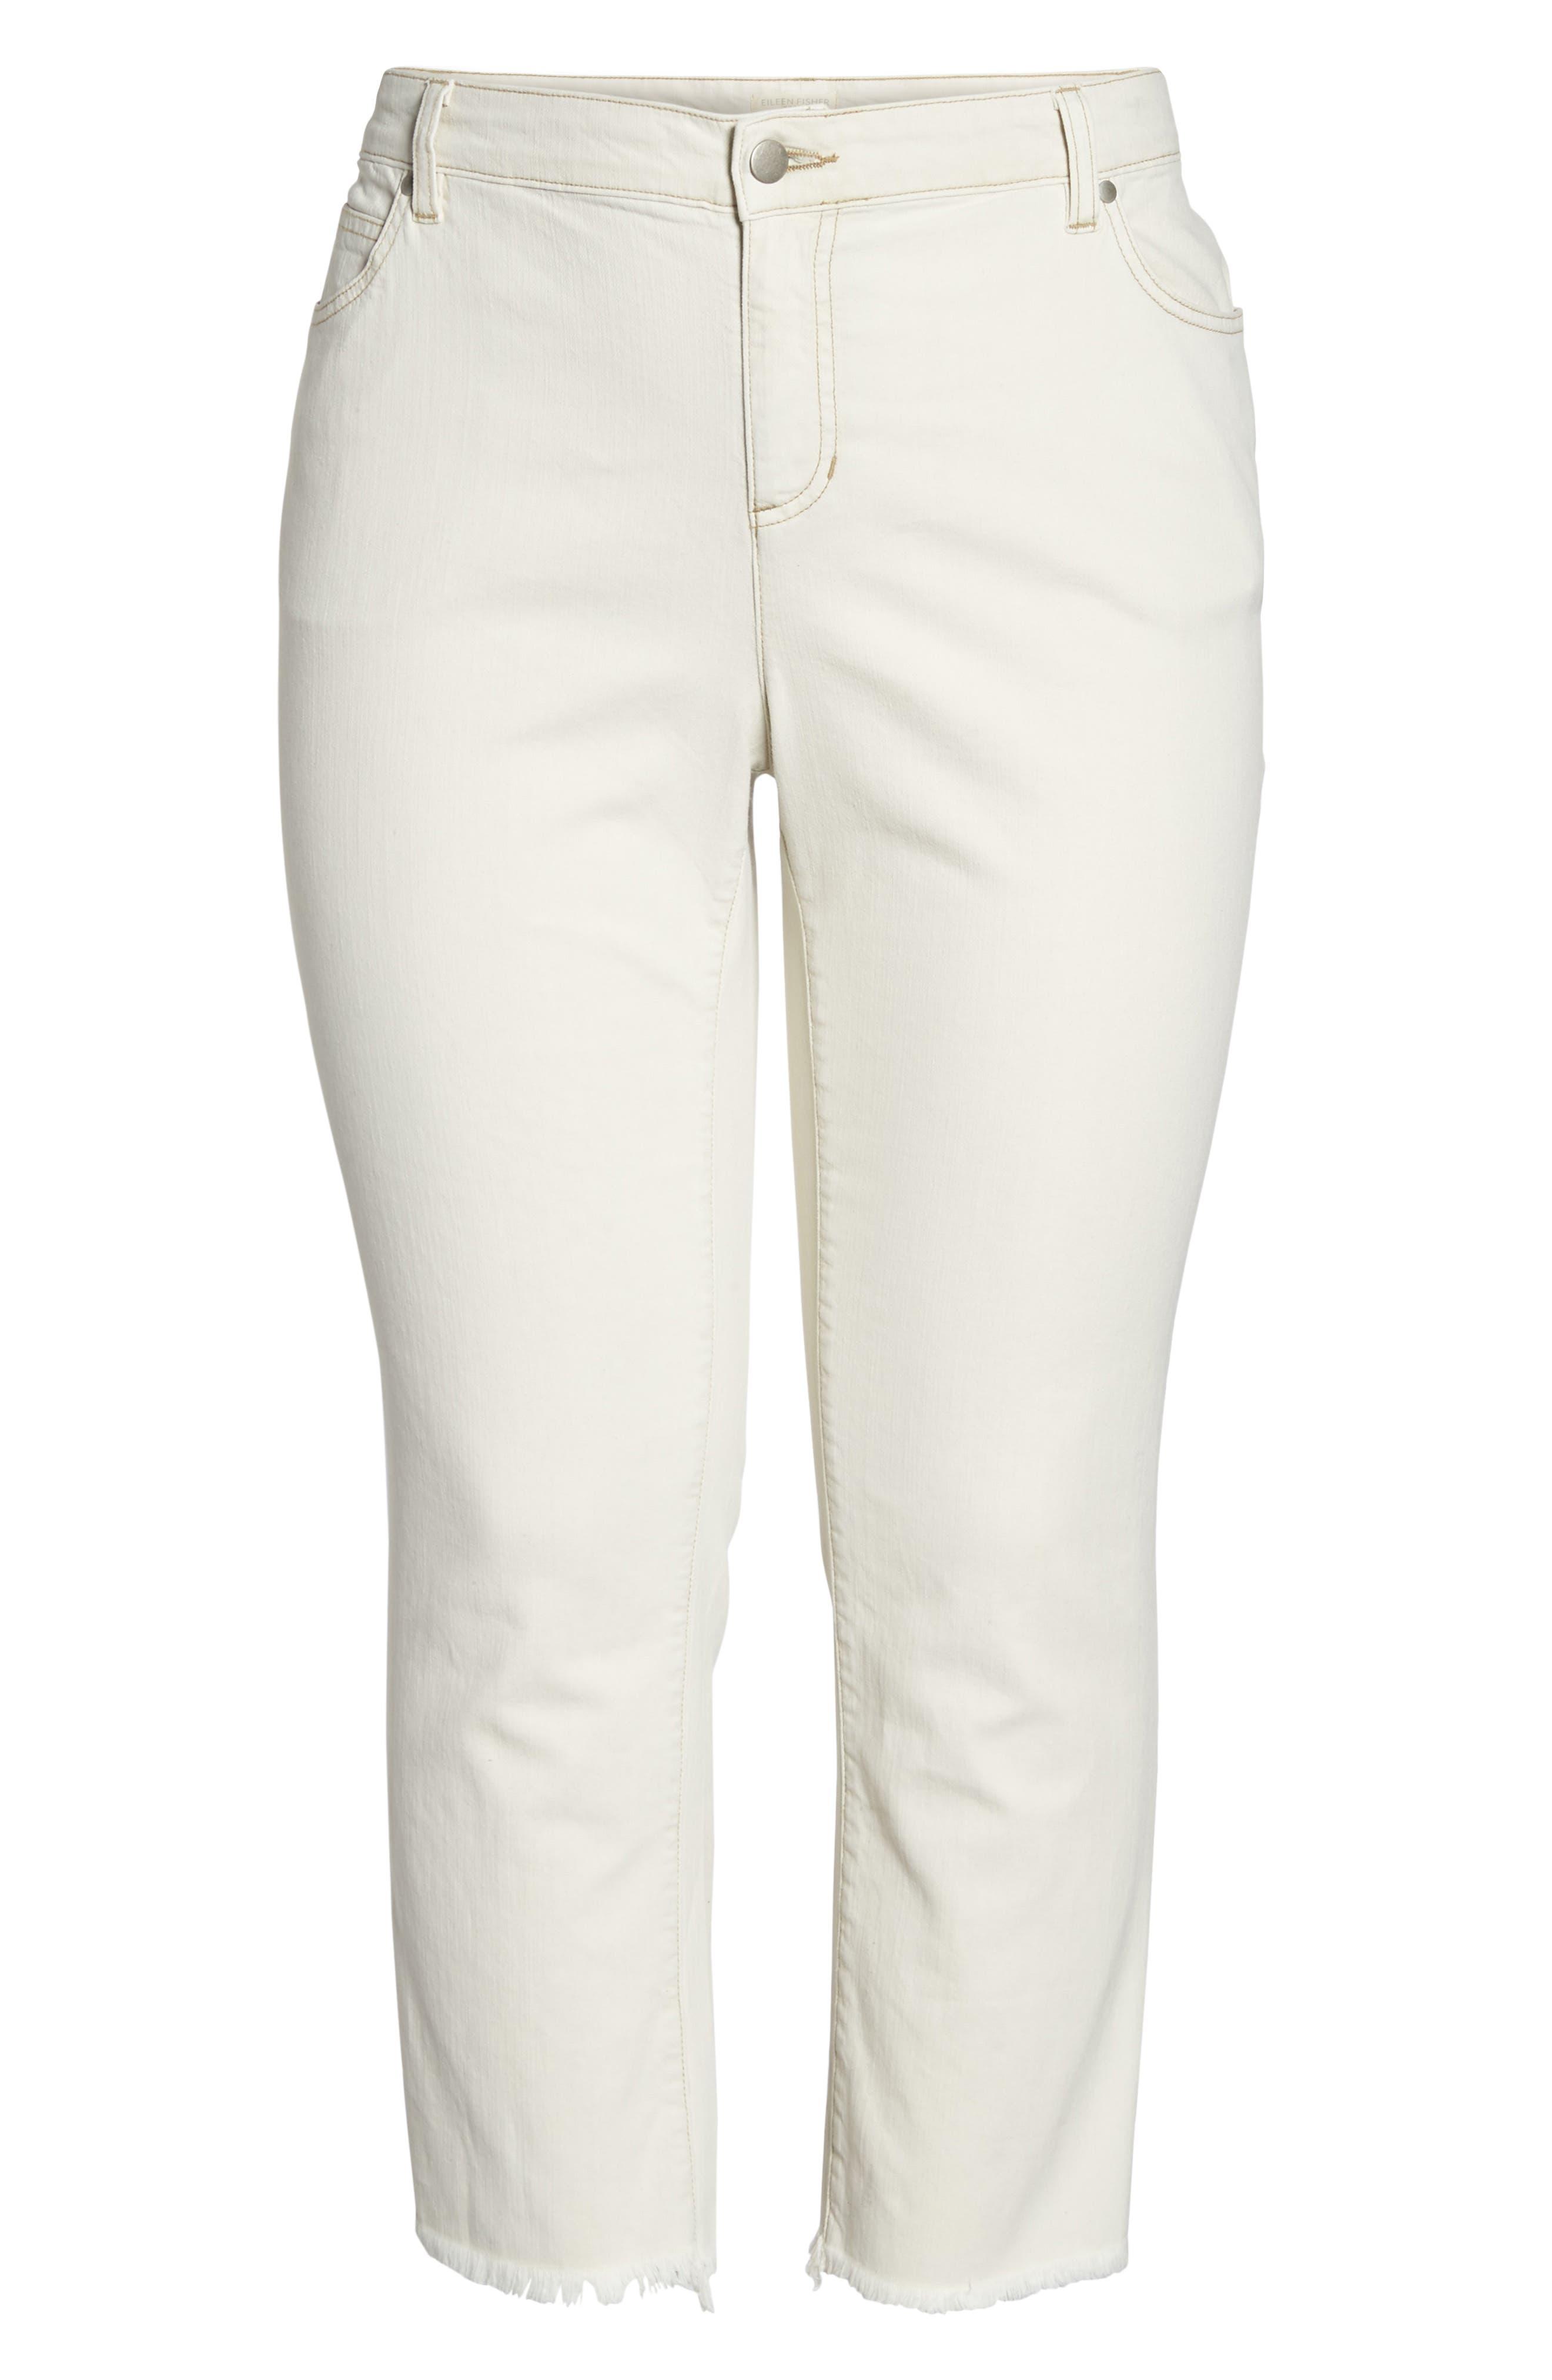 Stretch Organic Denim Crop Jeans,                             Alternate thumbnail 6, color,                             251